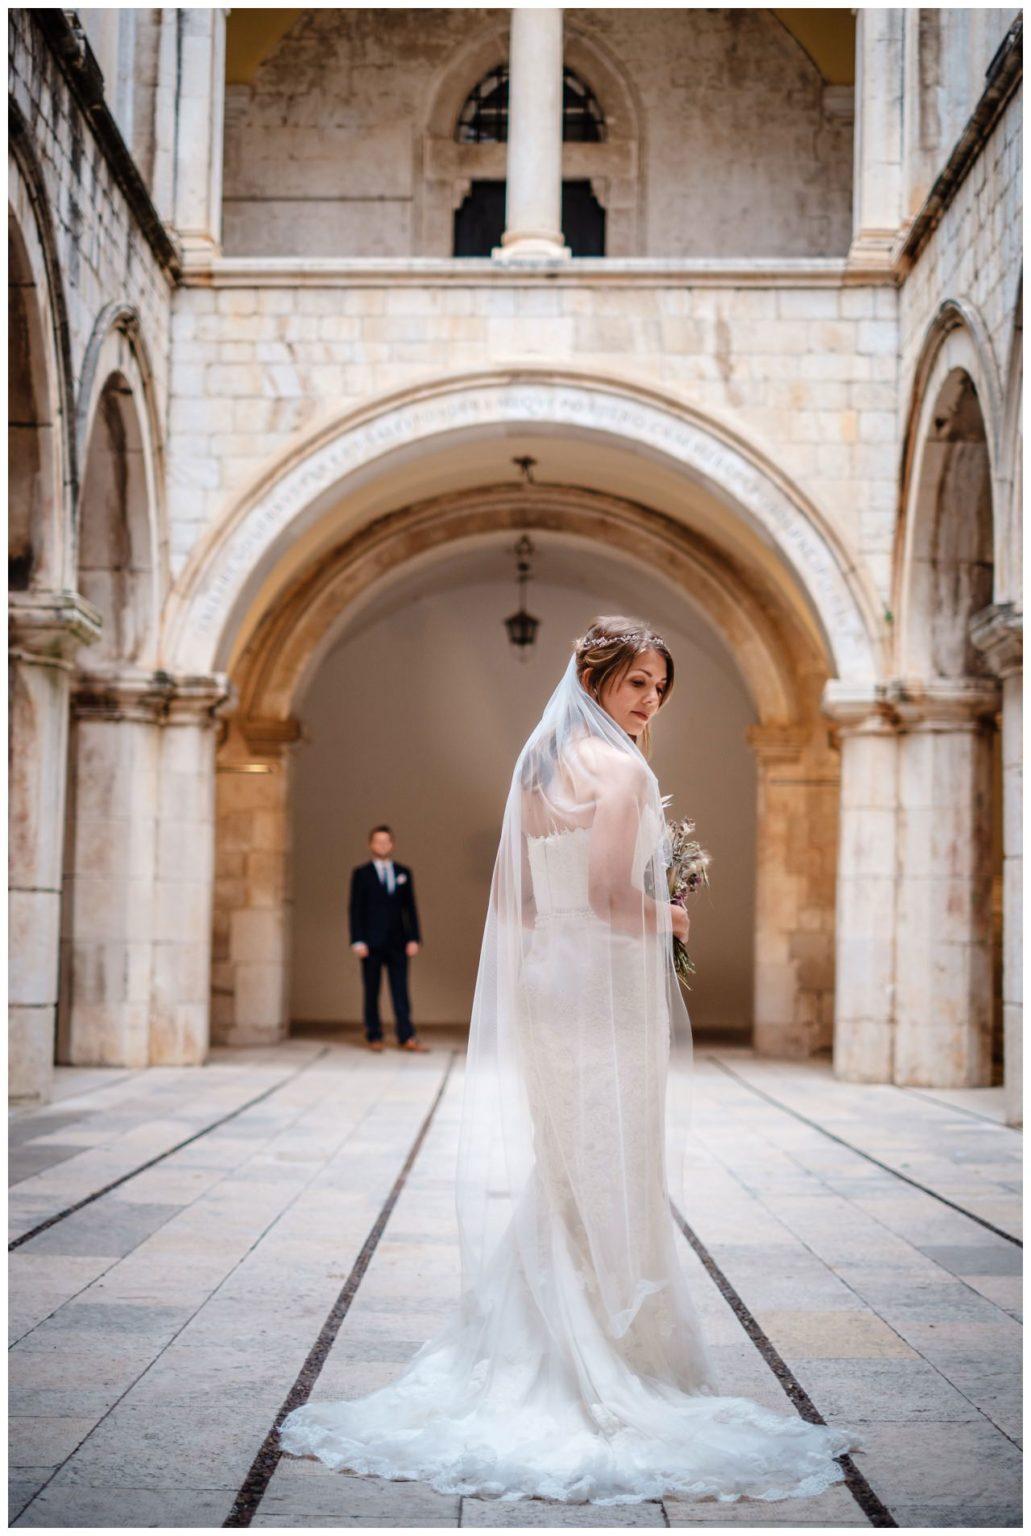 after wedding shooting kroatien hochzeitsfotos 20 - After Wedding Shooting in Kroatien